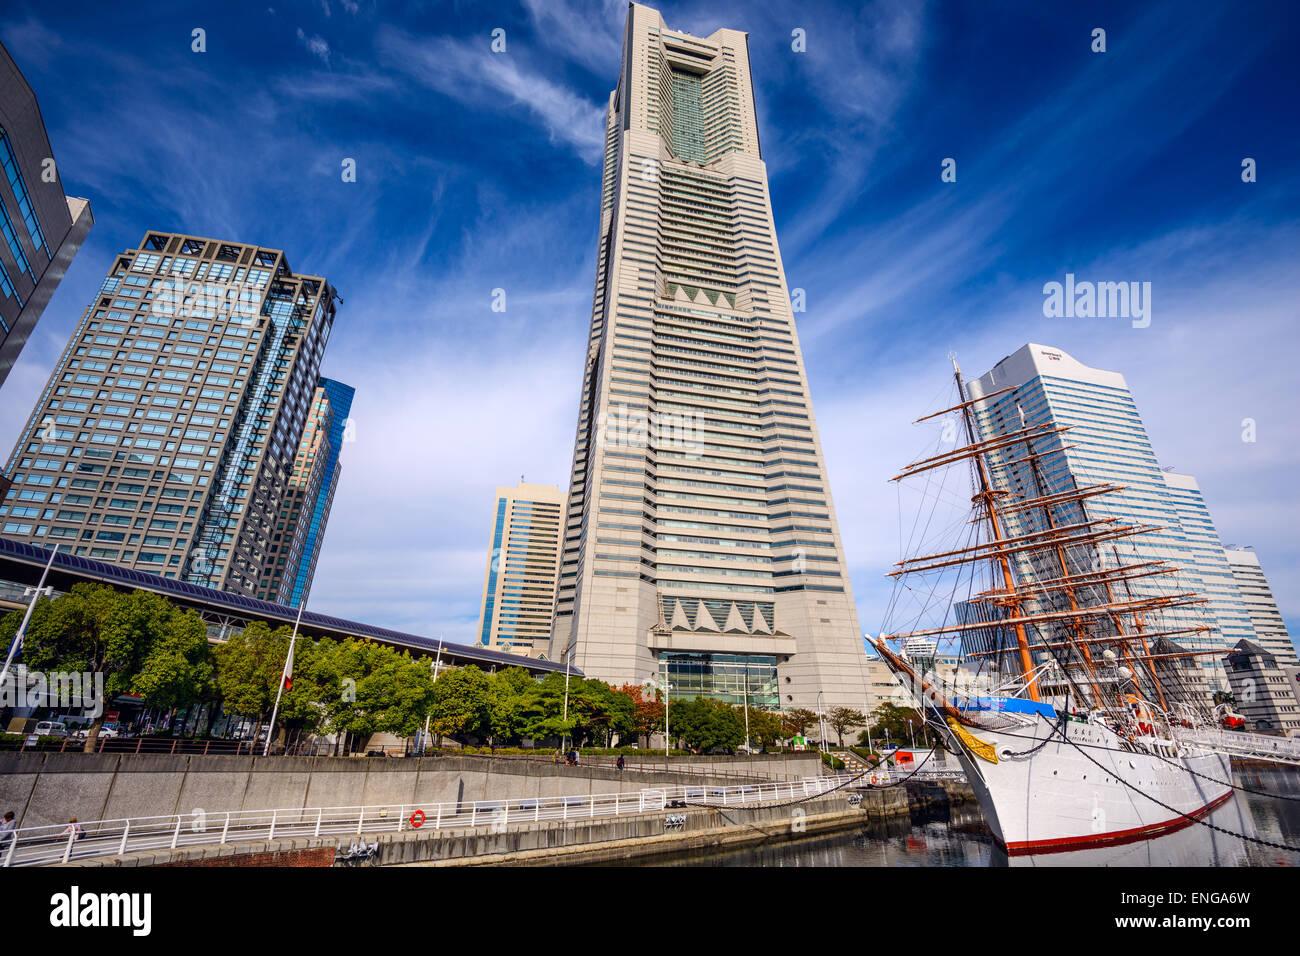 Landmark Tower e Nippon Maru nave museo nel Nippon Maru Memorial Park. Immagini Stock